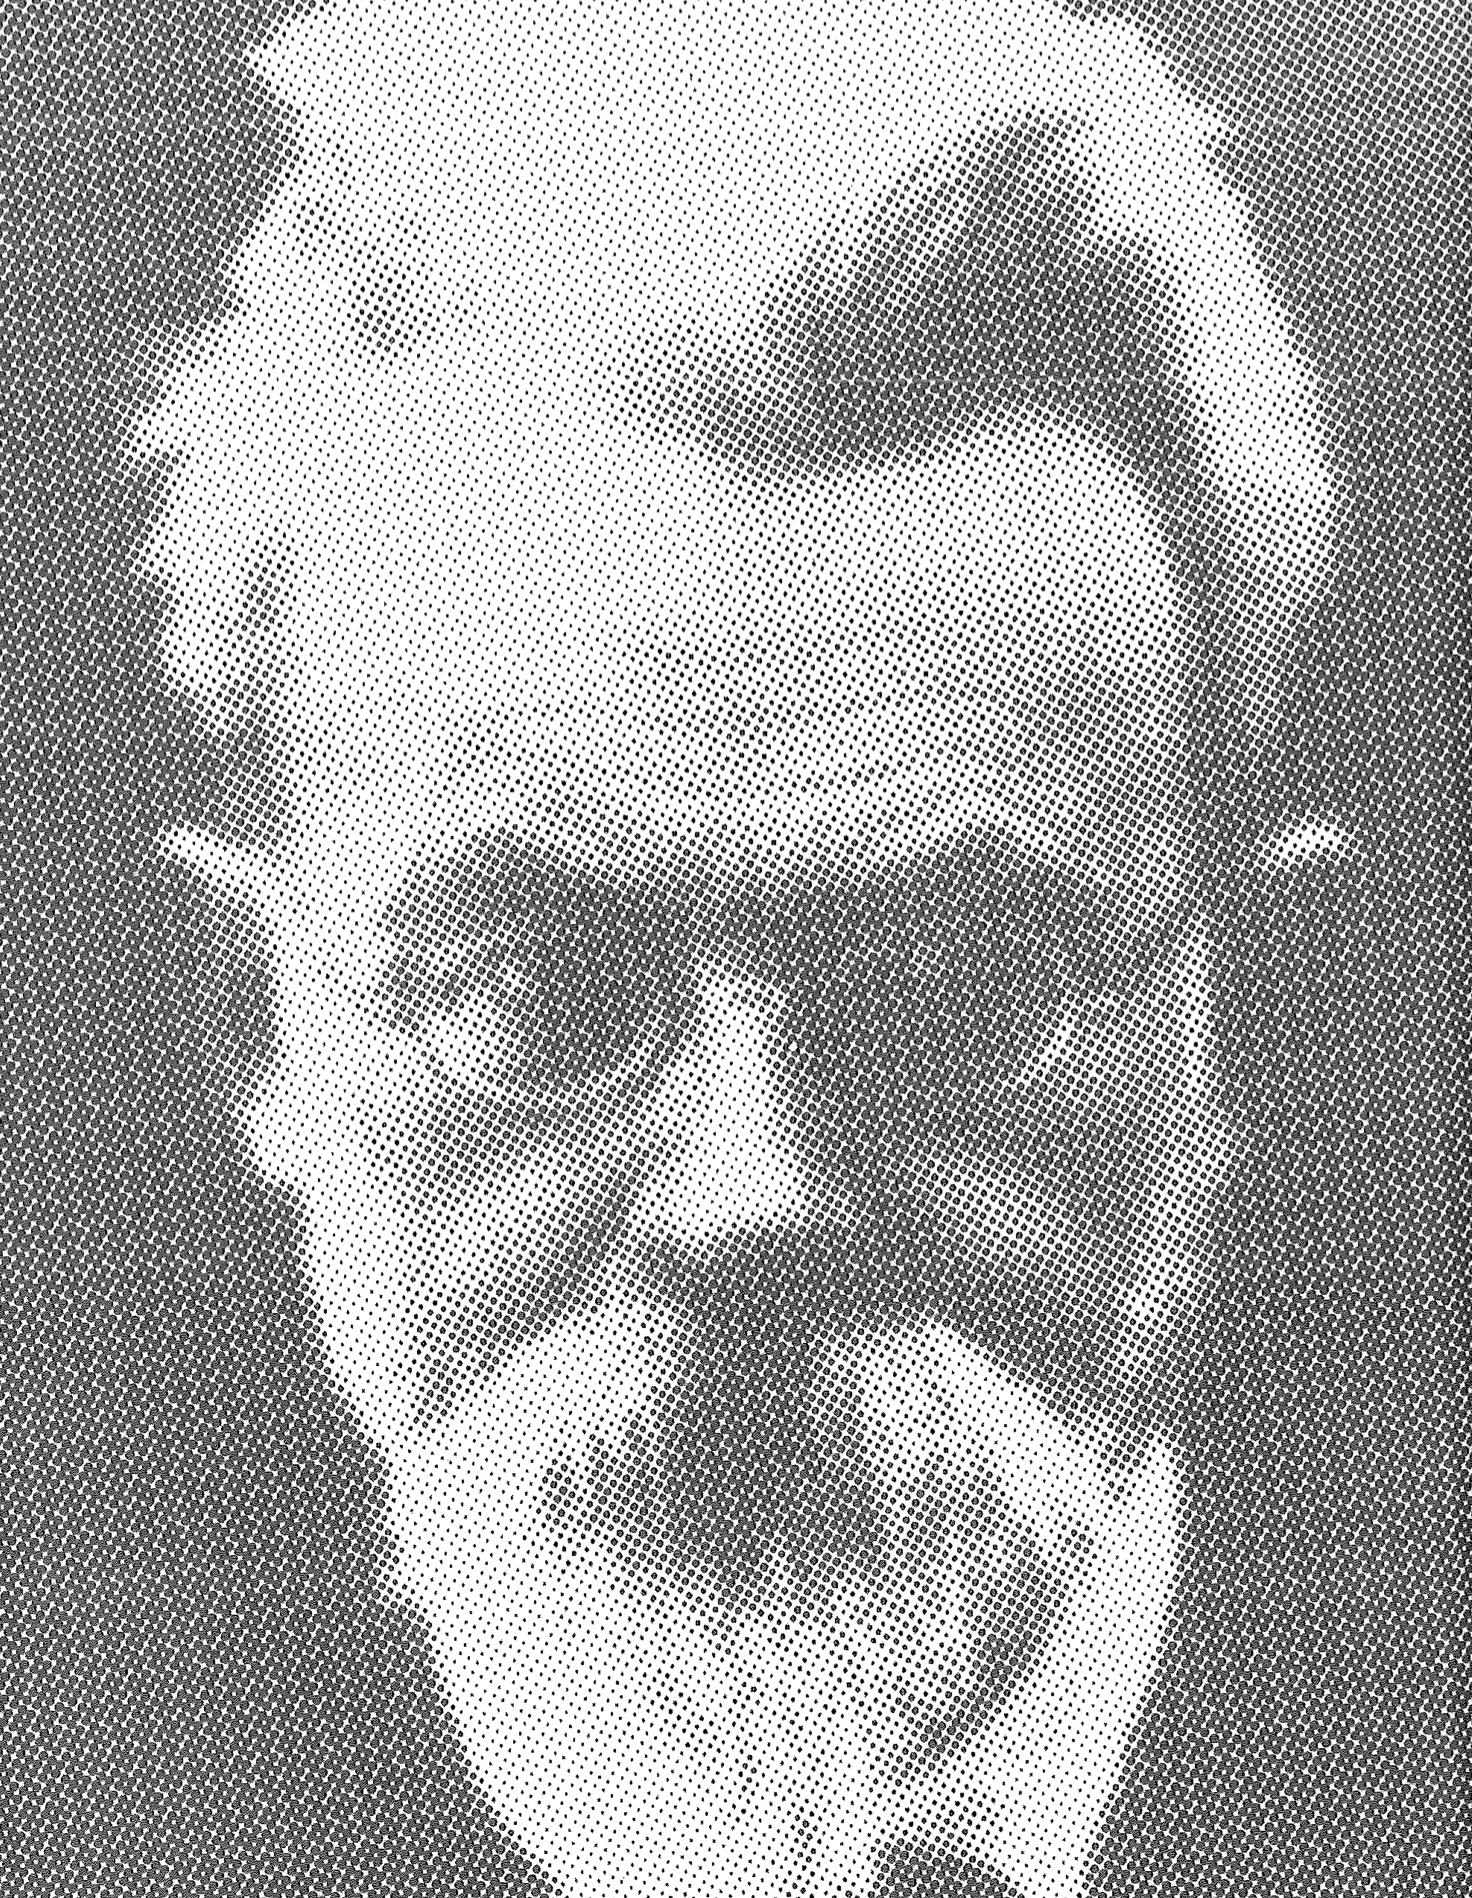 Image : Vladimir Vernadsky